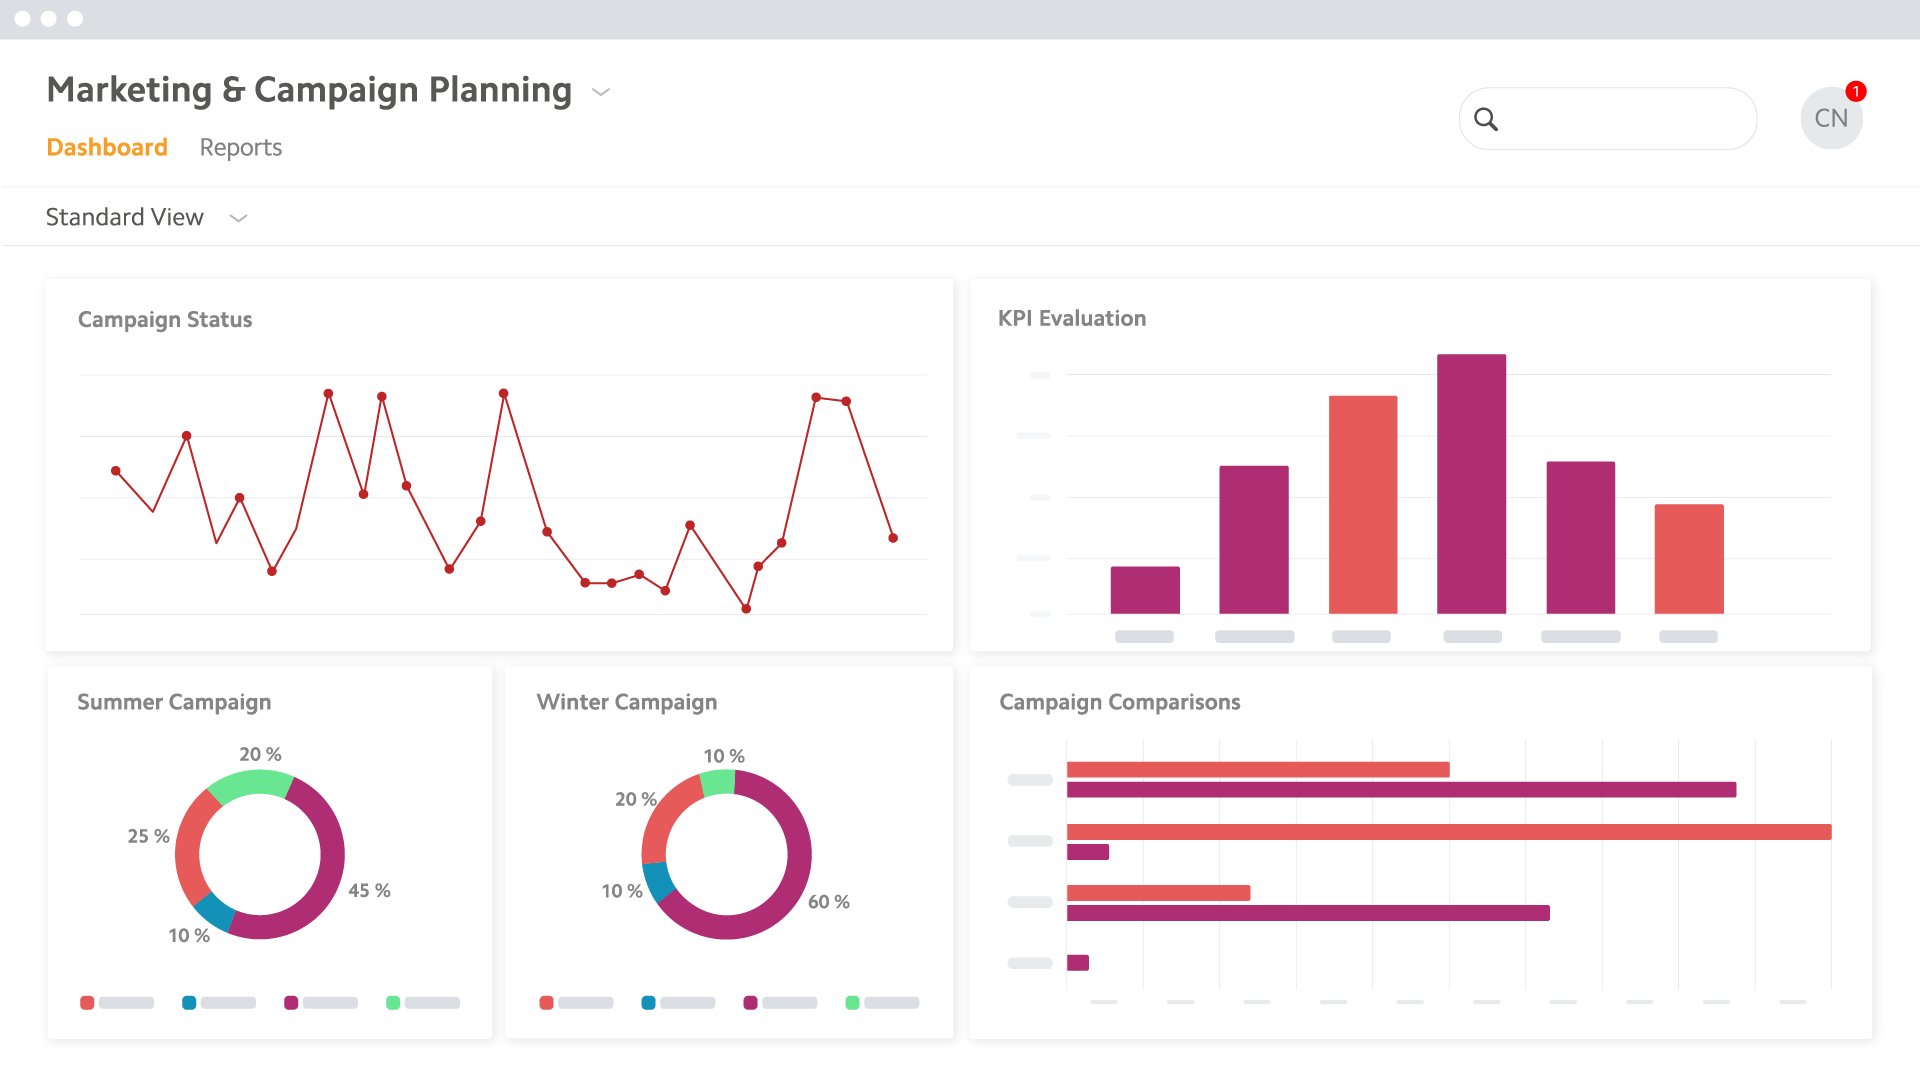 BrandMaker Performance Measurement & Optimization